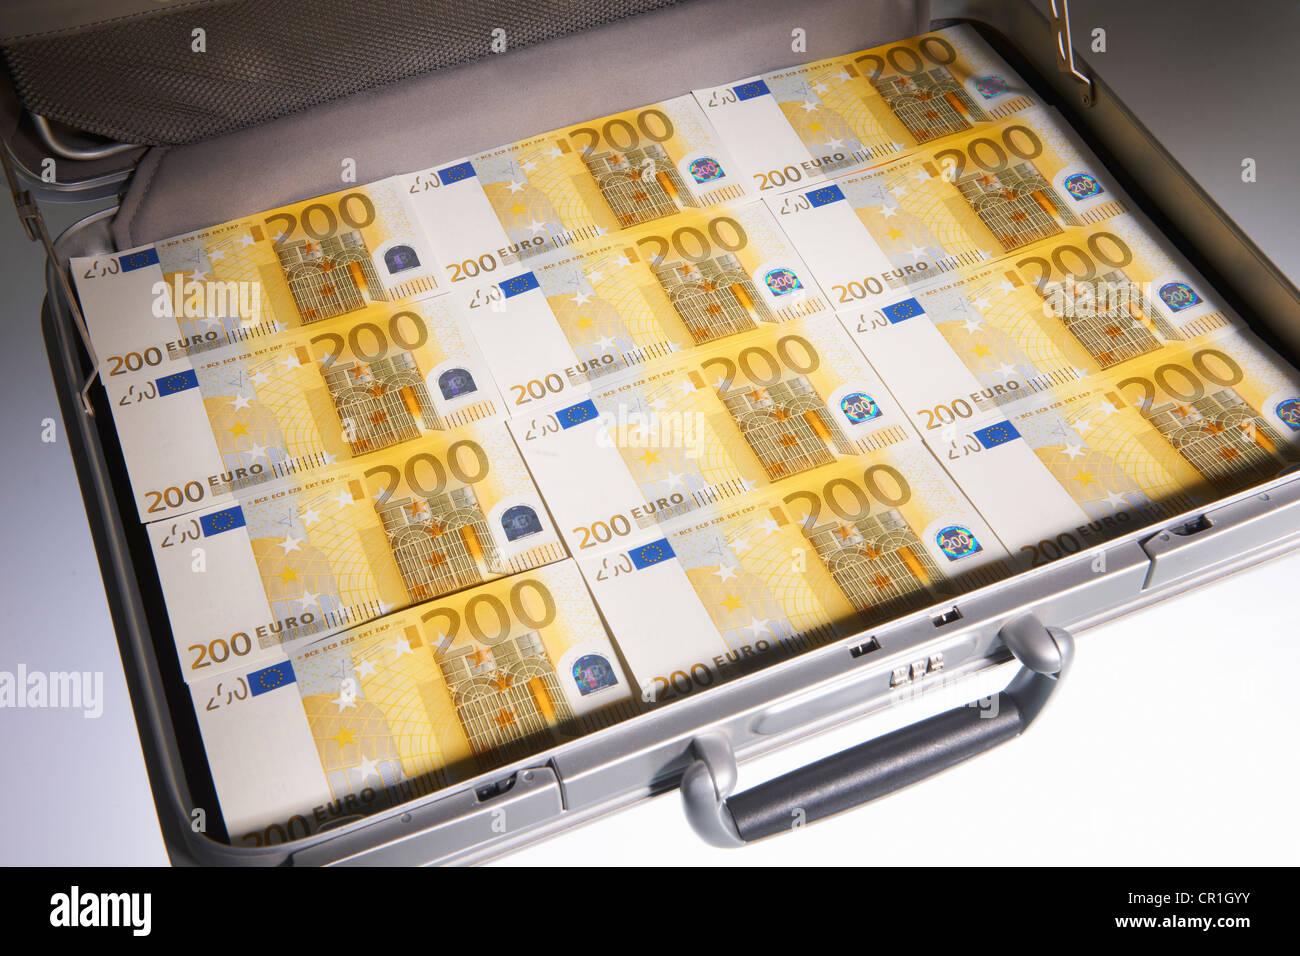 Suitcase full of Euro bills - Stock Image